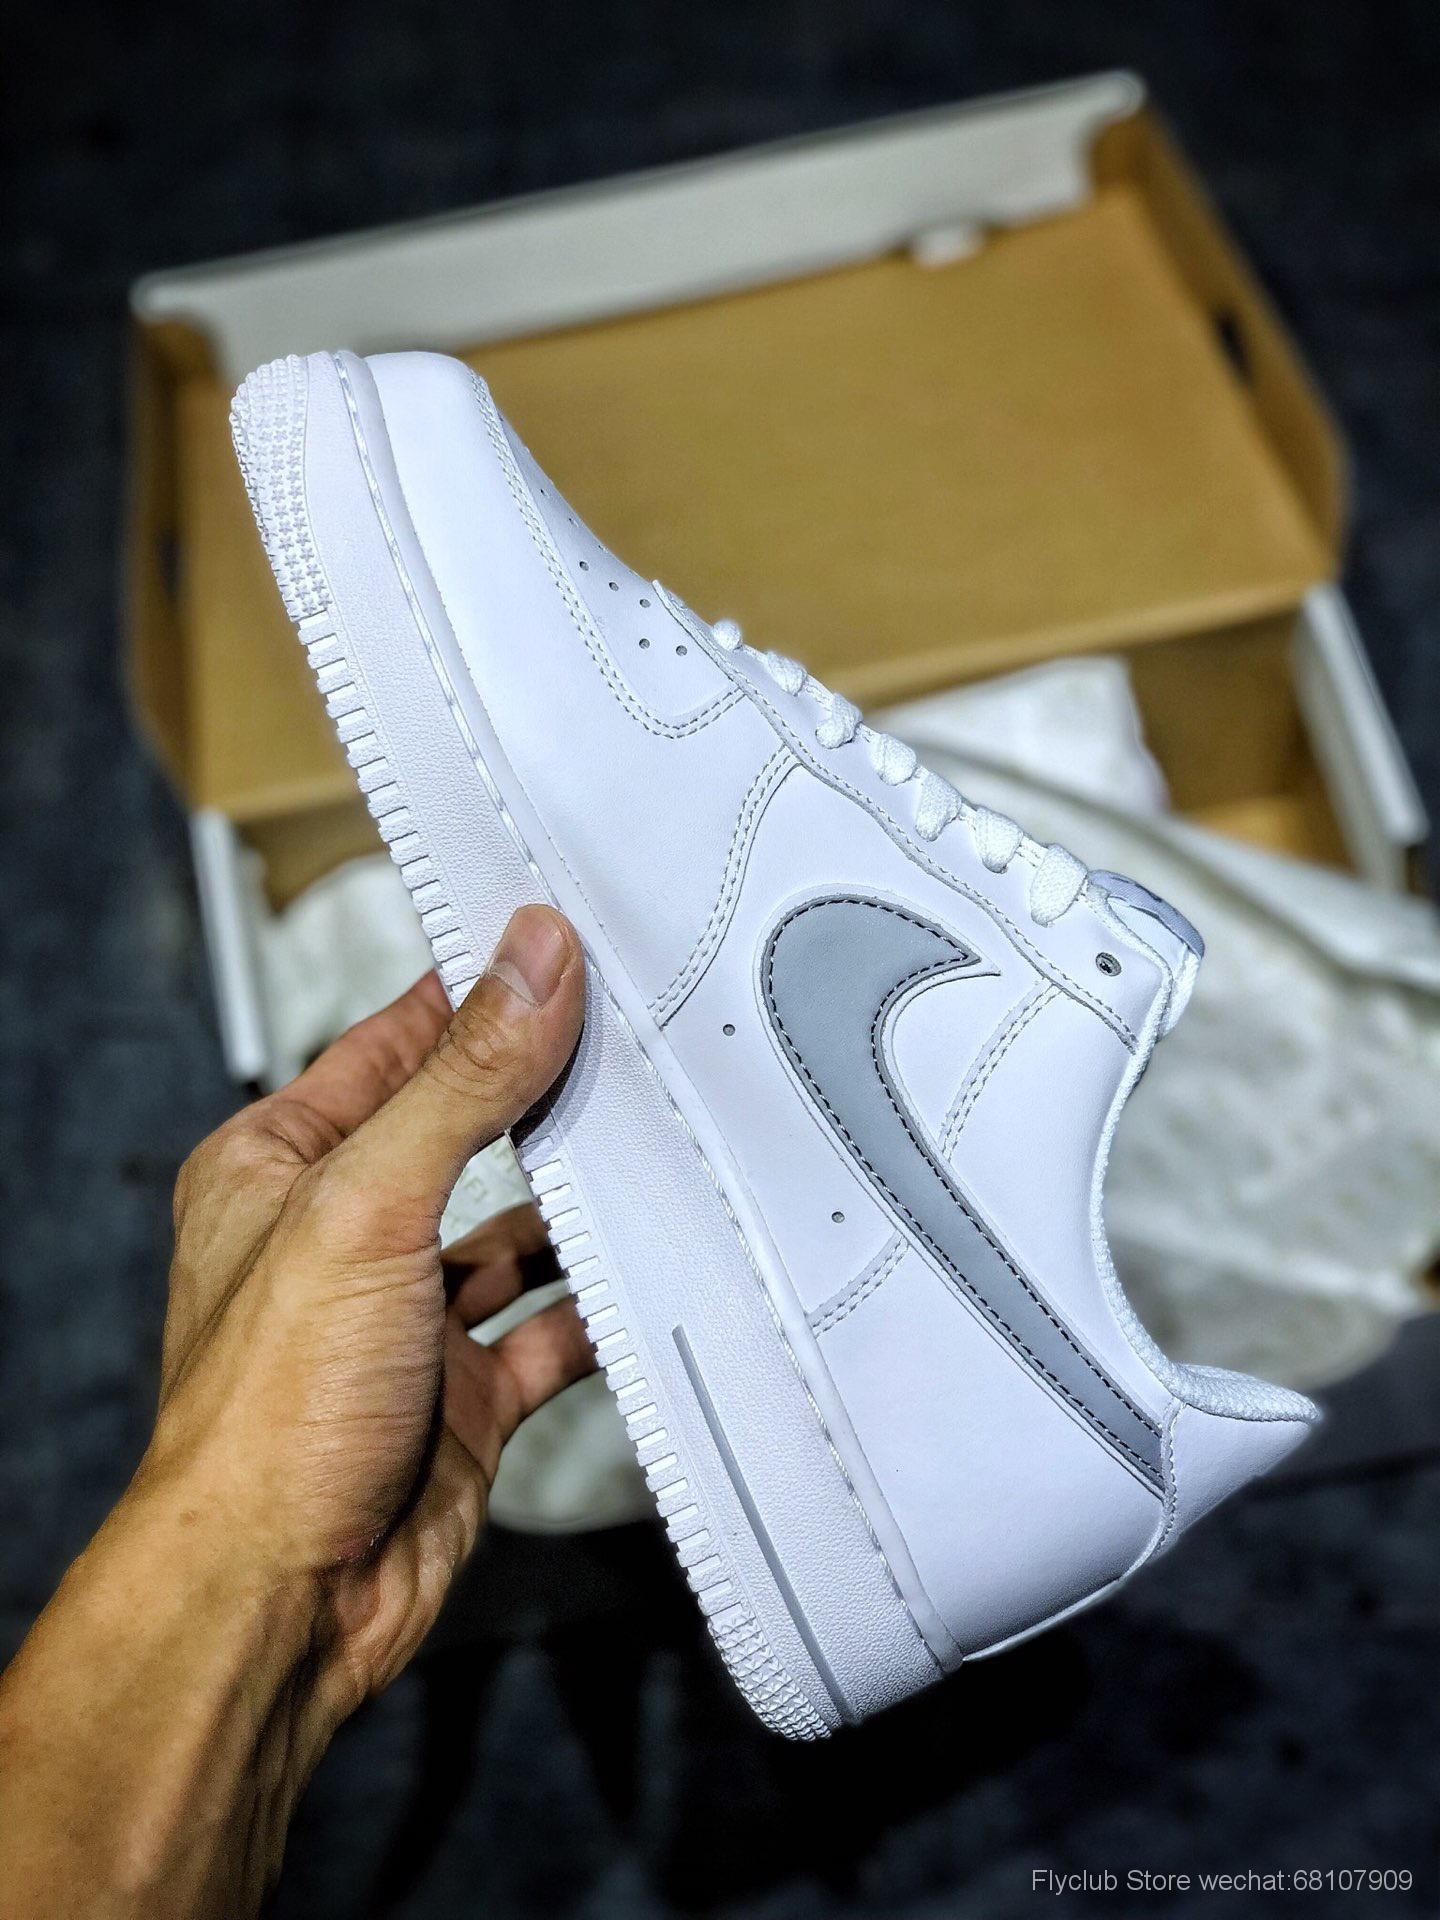 Nike Air Force 1 '07 空军一号低帮百搭休闲运动板鞋   货号:AO2423-106